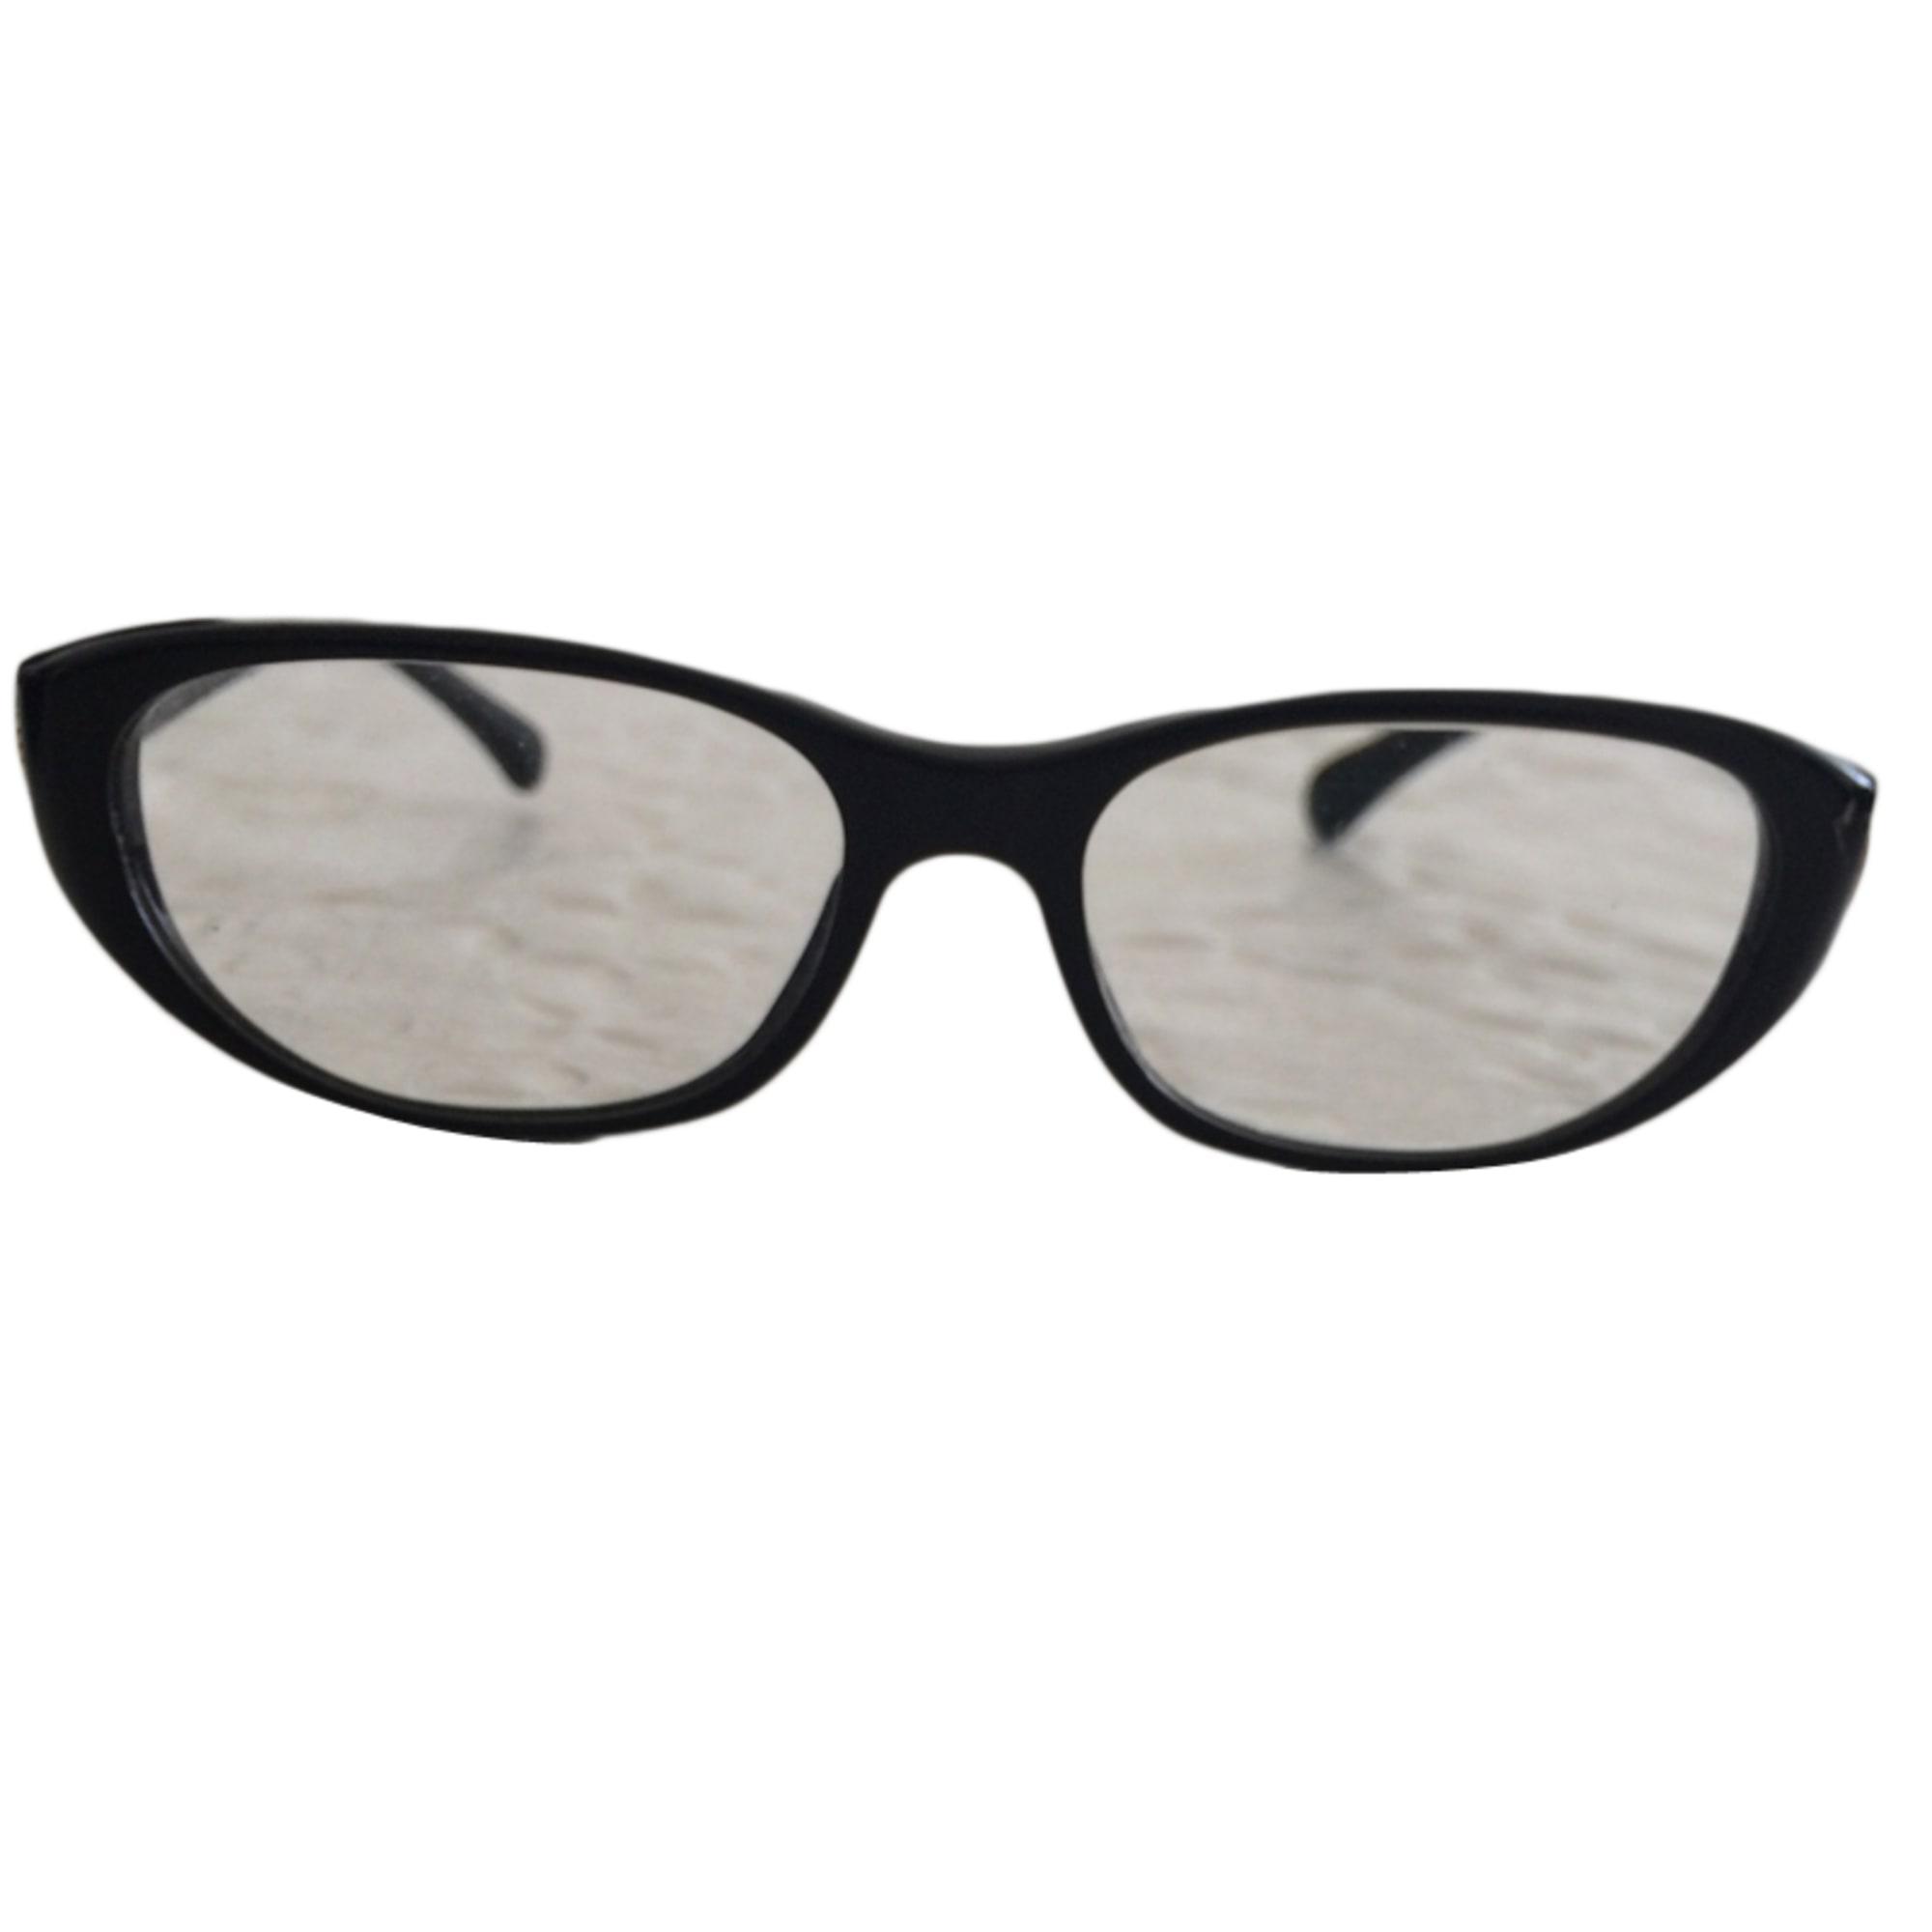 eyeglass frames chanel black 3720573